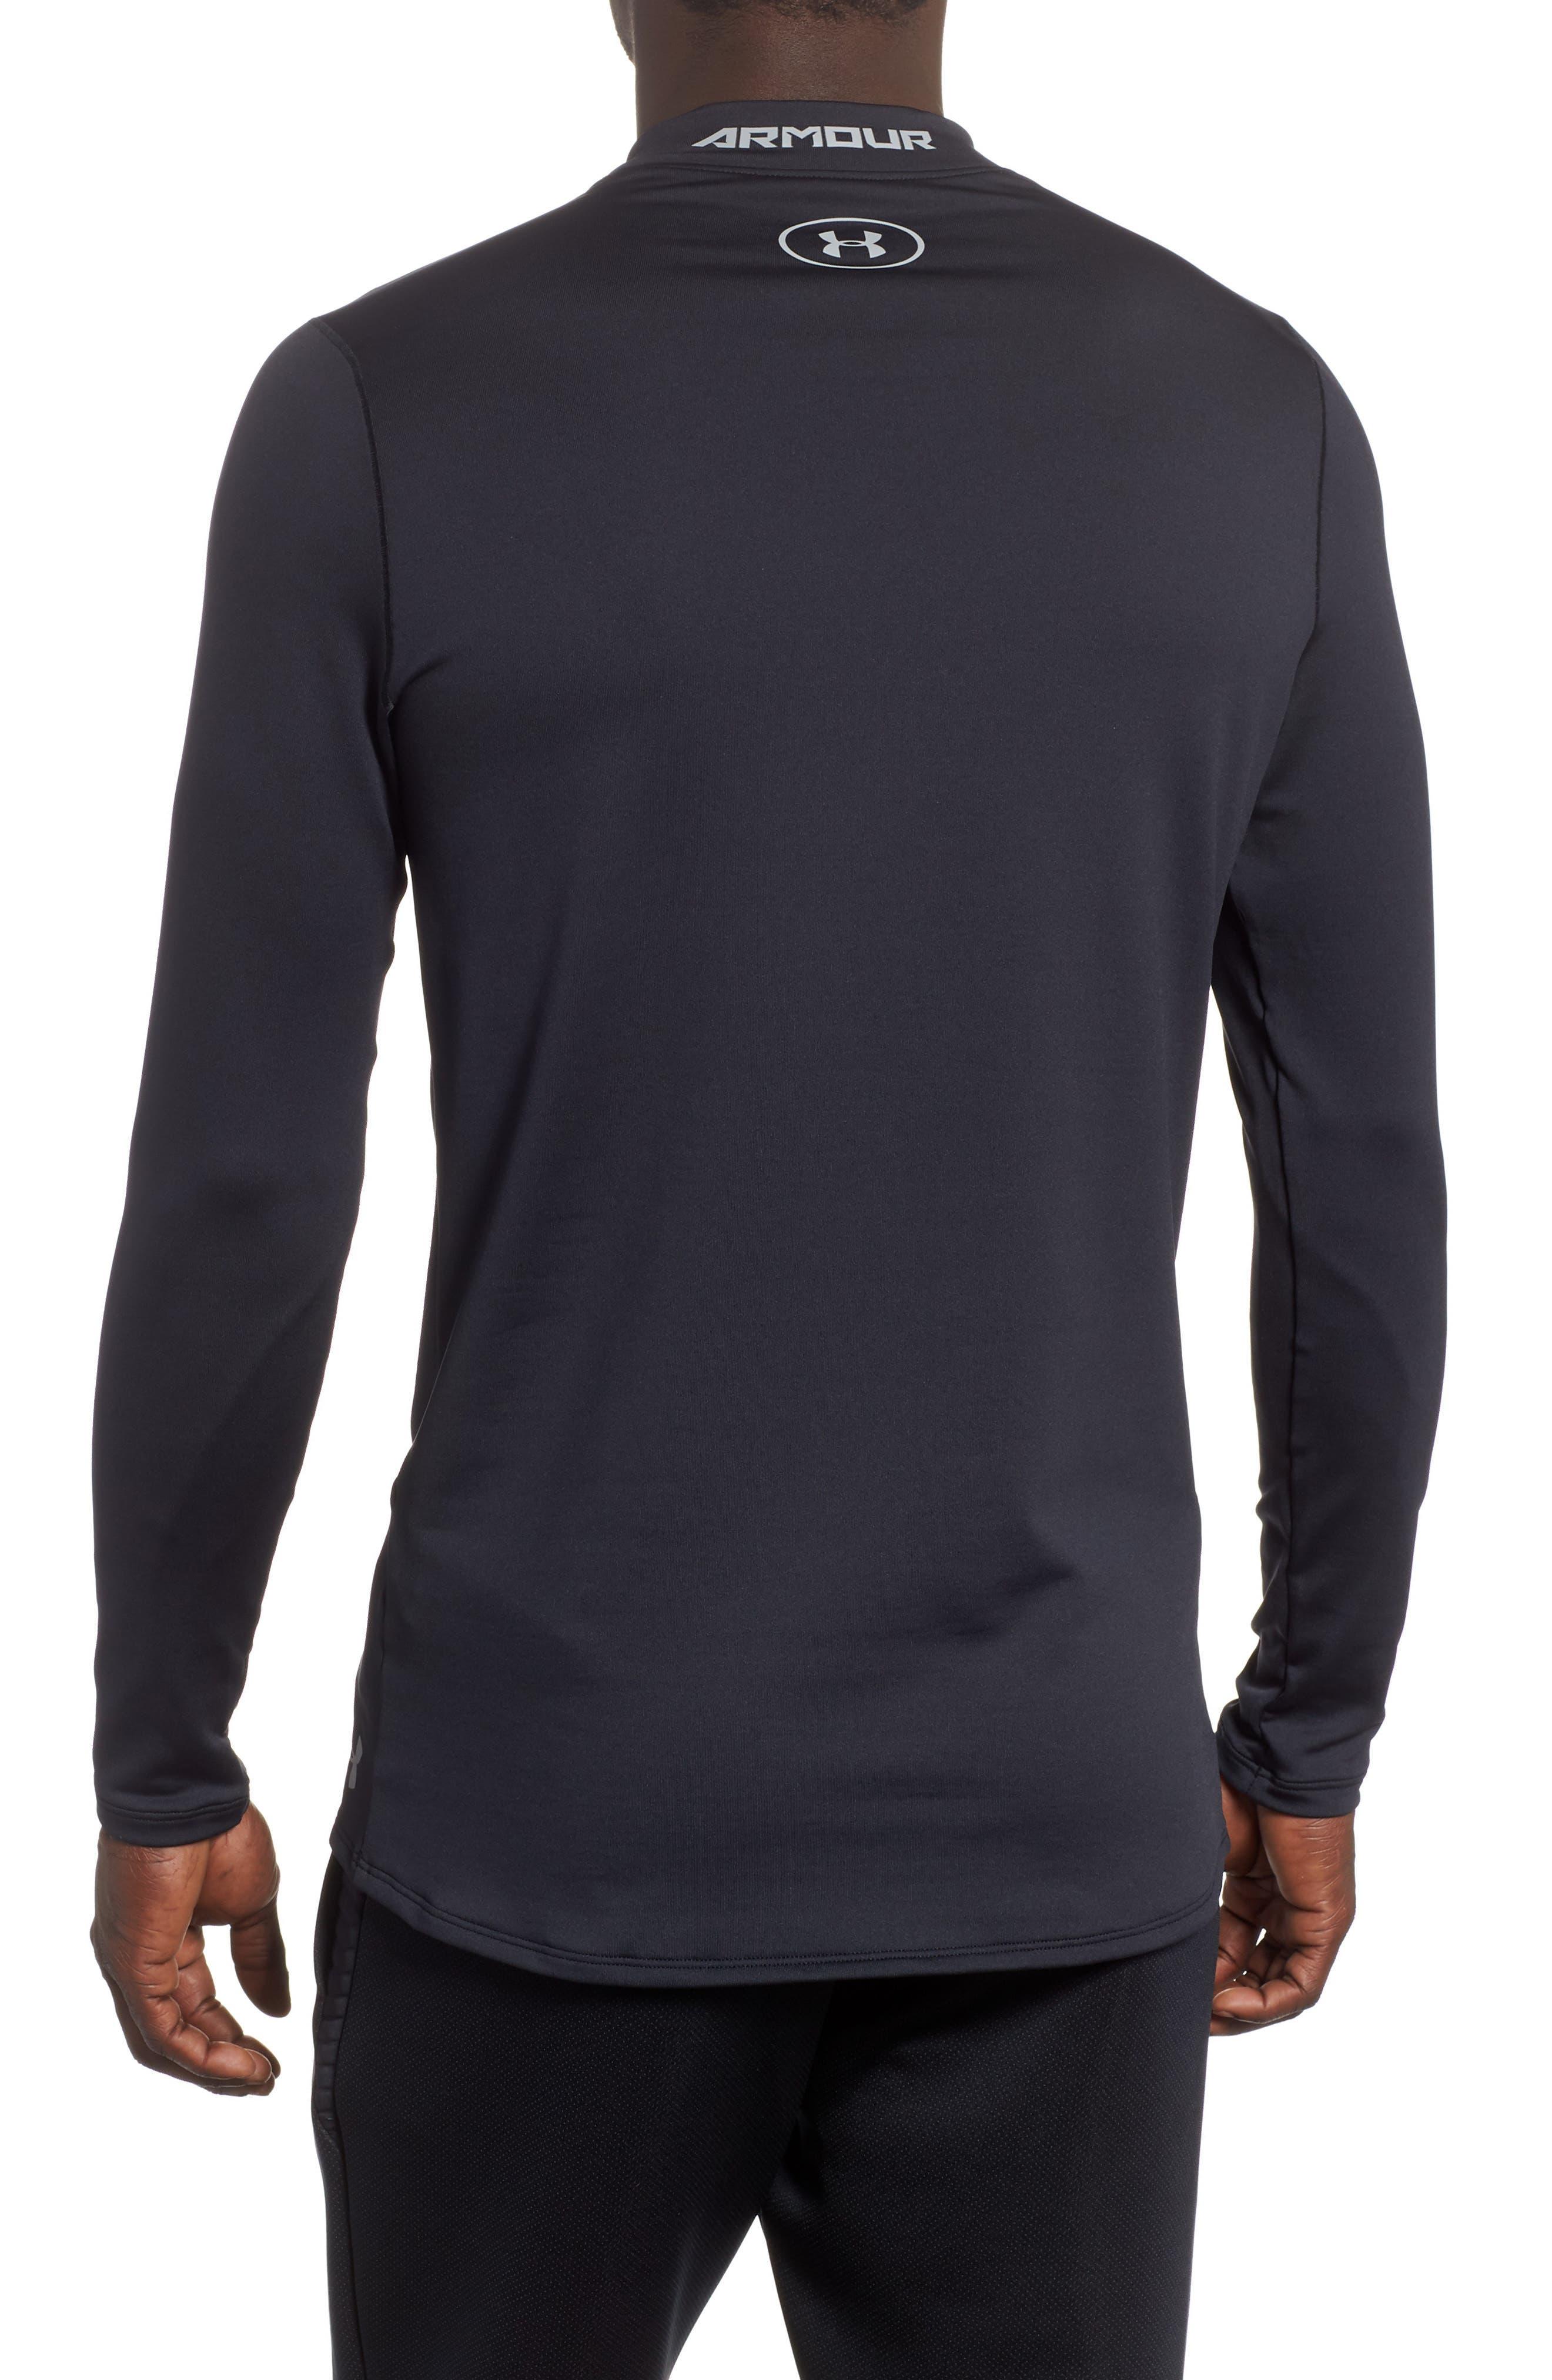 ColdGear<sup>®</sup> Mock Neck Long Sleeve T-Shirt,                             Alternate thumbnail 2, color,                             BLACK/ STEEL